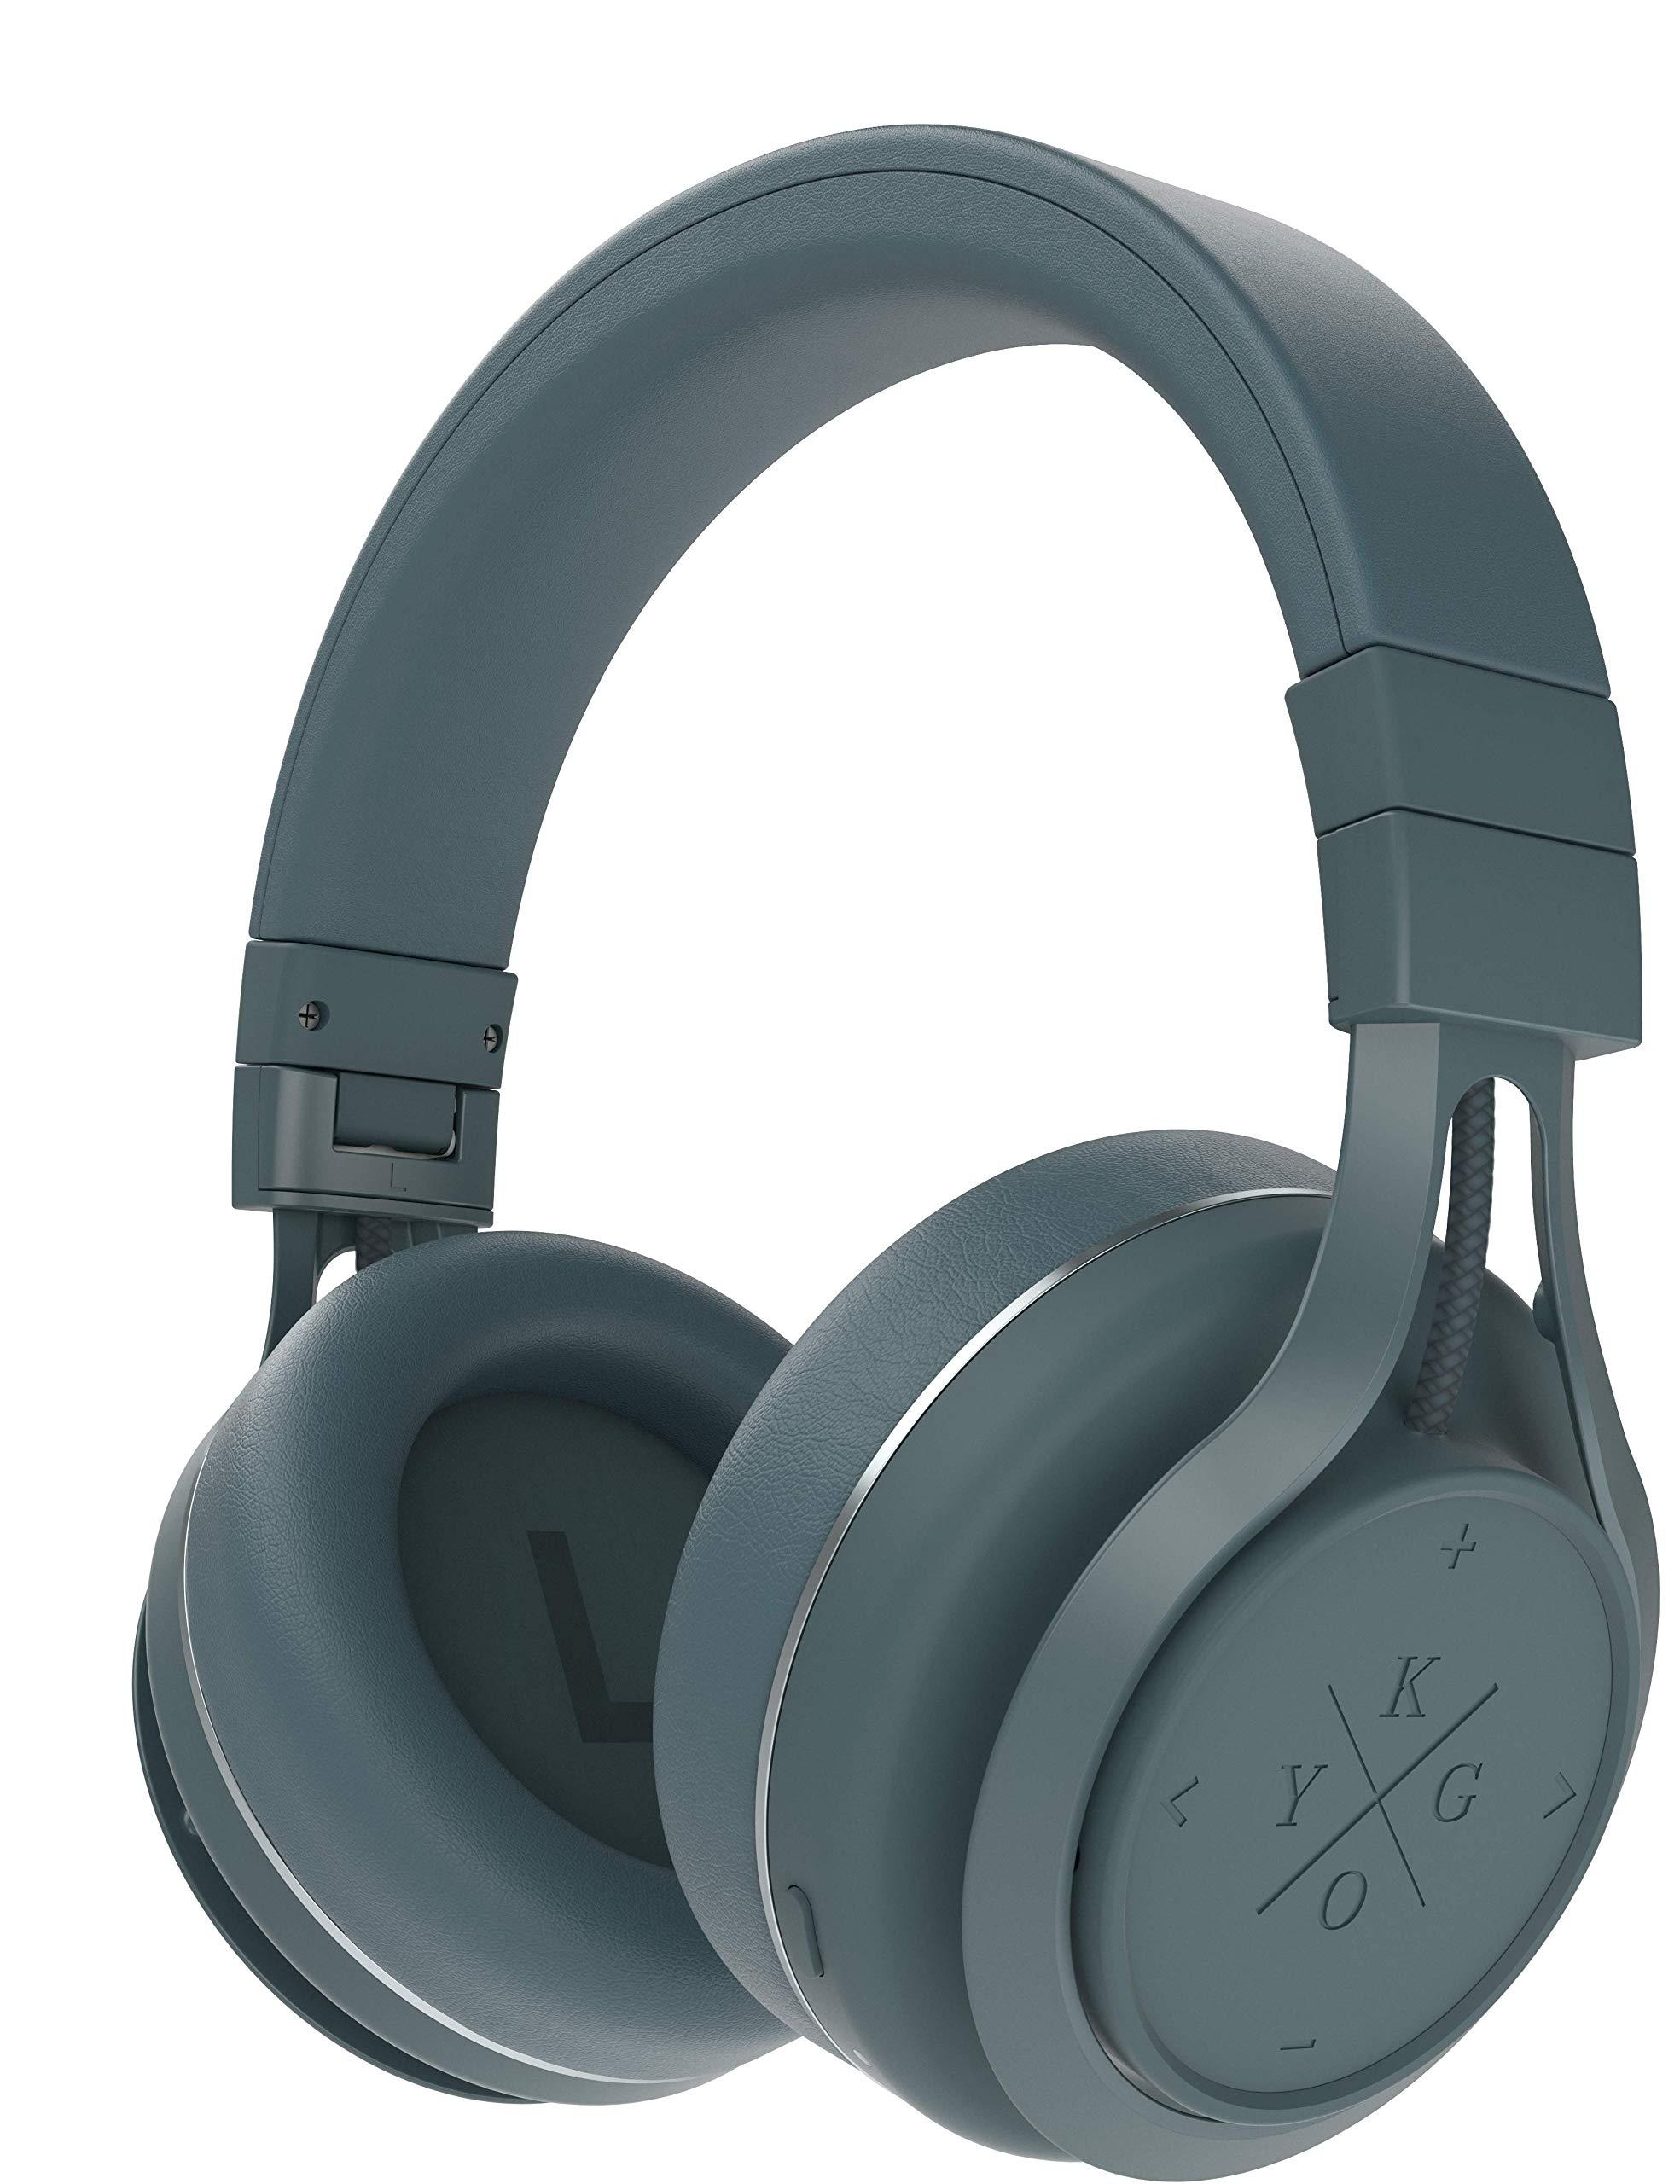 Amazon Com Kygo Life A9 600 Over Ear Bluetooth Headphones Aptx And Aac Codecs Built In Microphone Nfc Pairing Memory Foam Ear Cushions 23 Hours Playback Kygo Sound App Pro Line Storm Gray Electronics